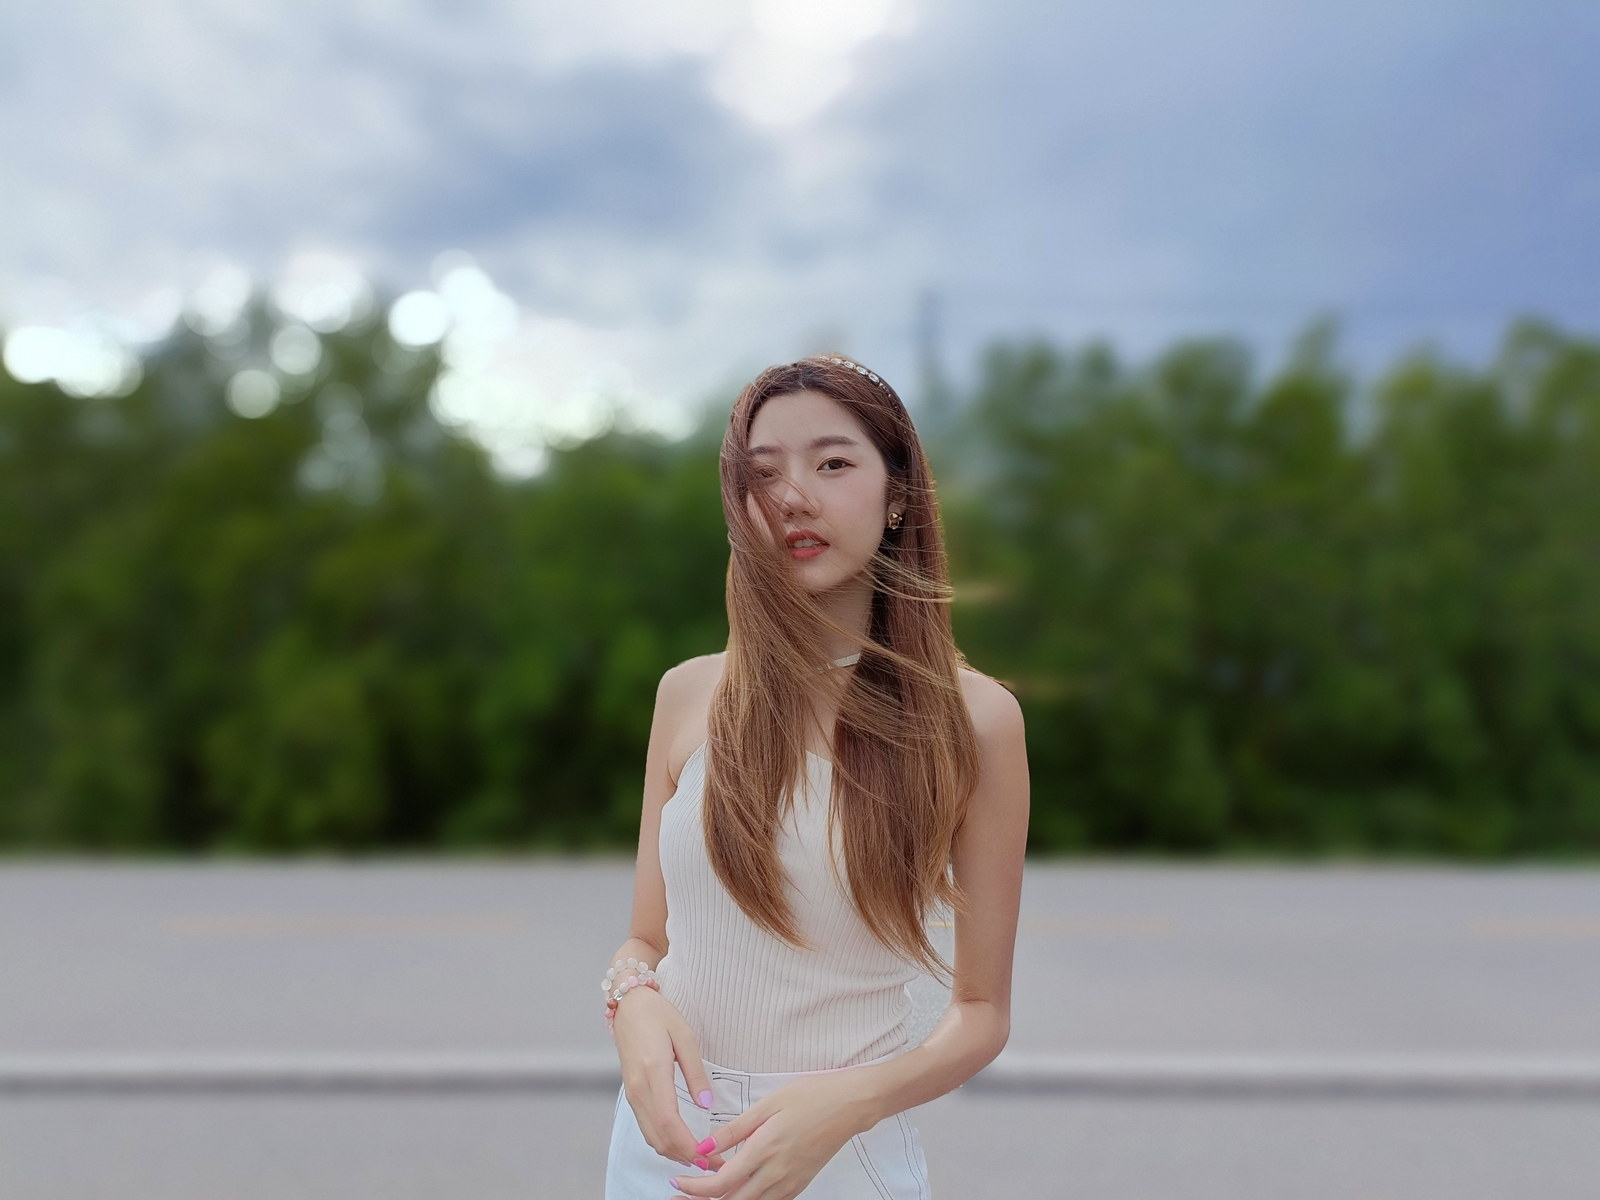 OPPO Reno6 5G - Bokeh Flare Portrait